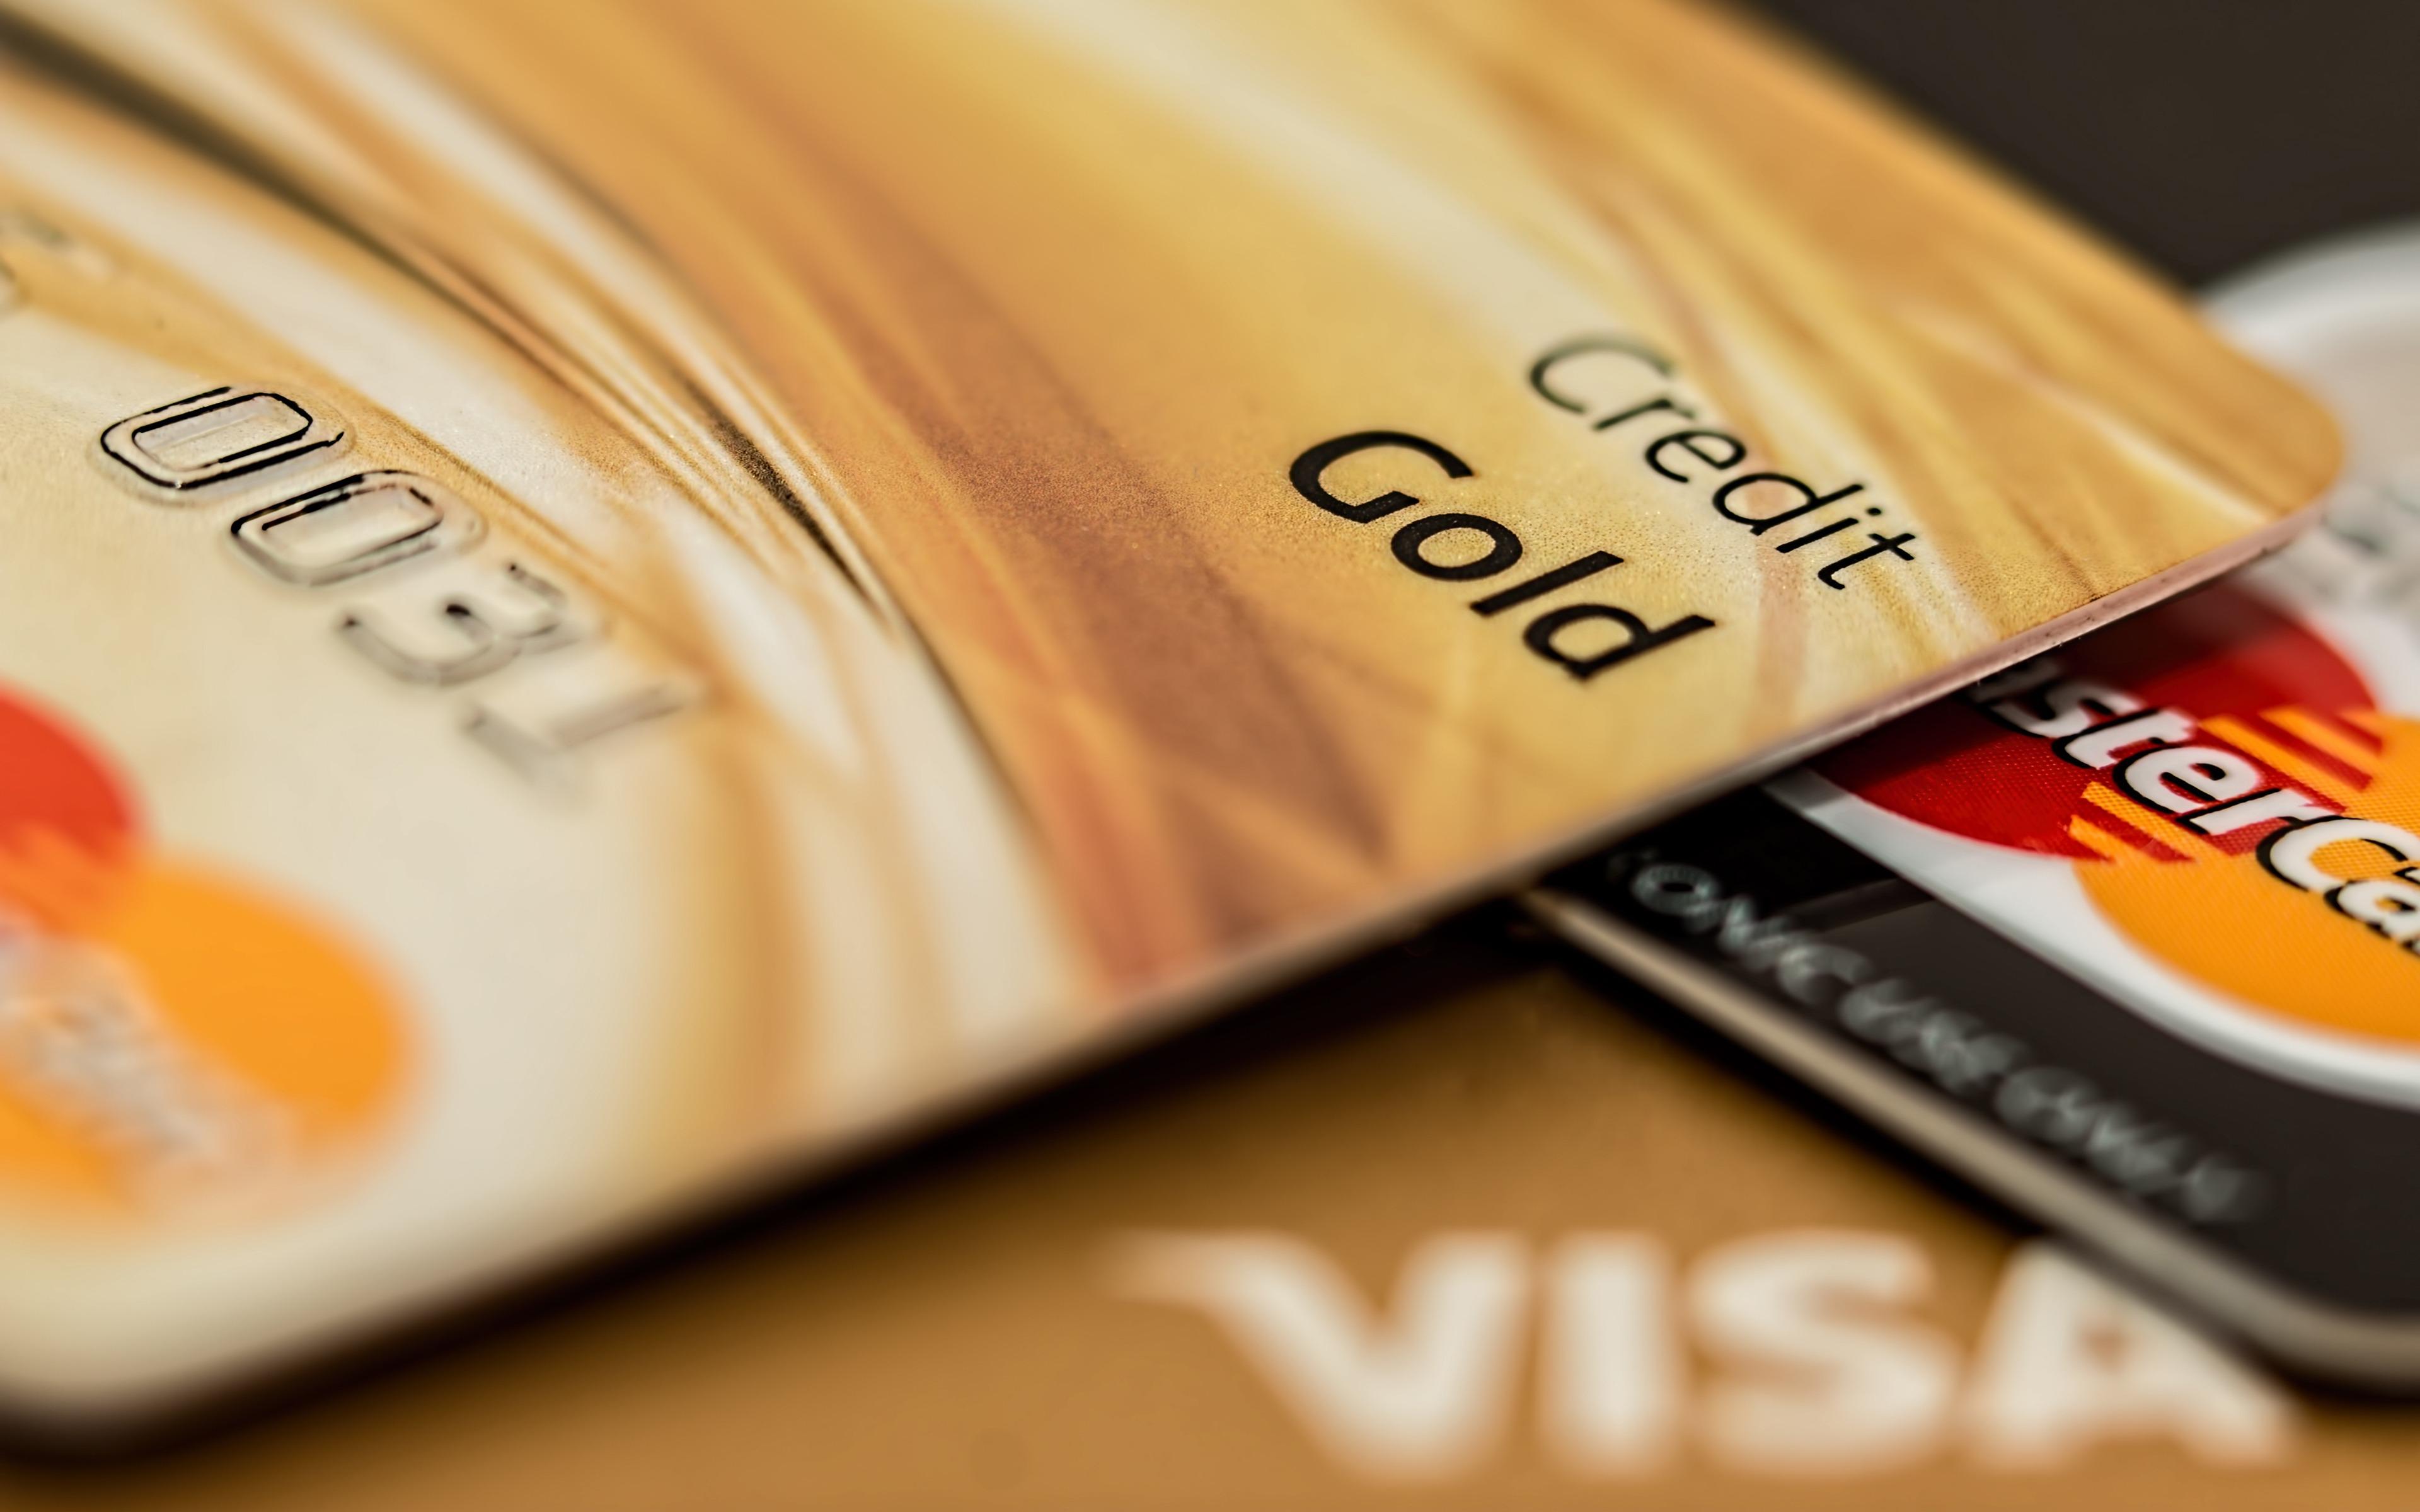 Bank visa business credit card preview 10wallpaper visa business credit card bankvisabusinesscreditcard original resolution 3840x2400 your resolution 1024x1024 colourmoves